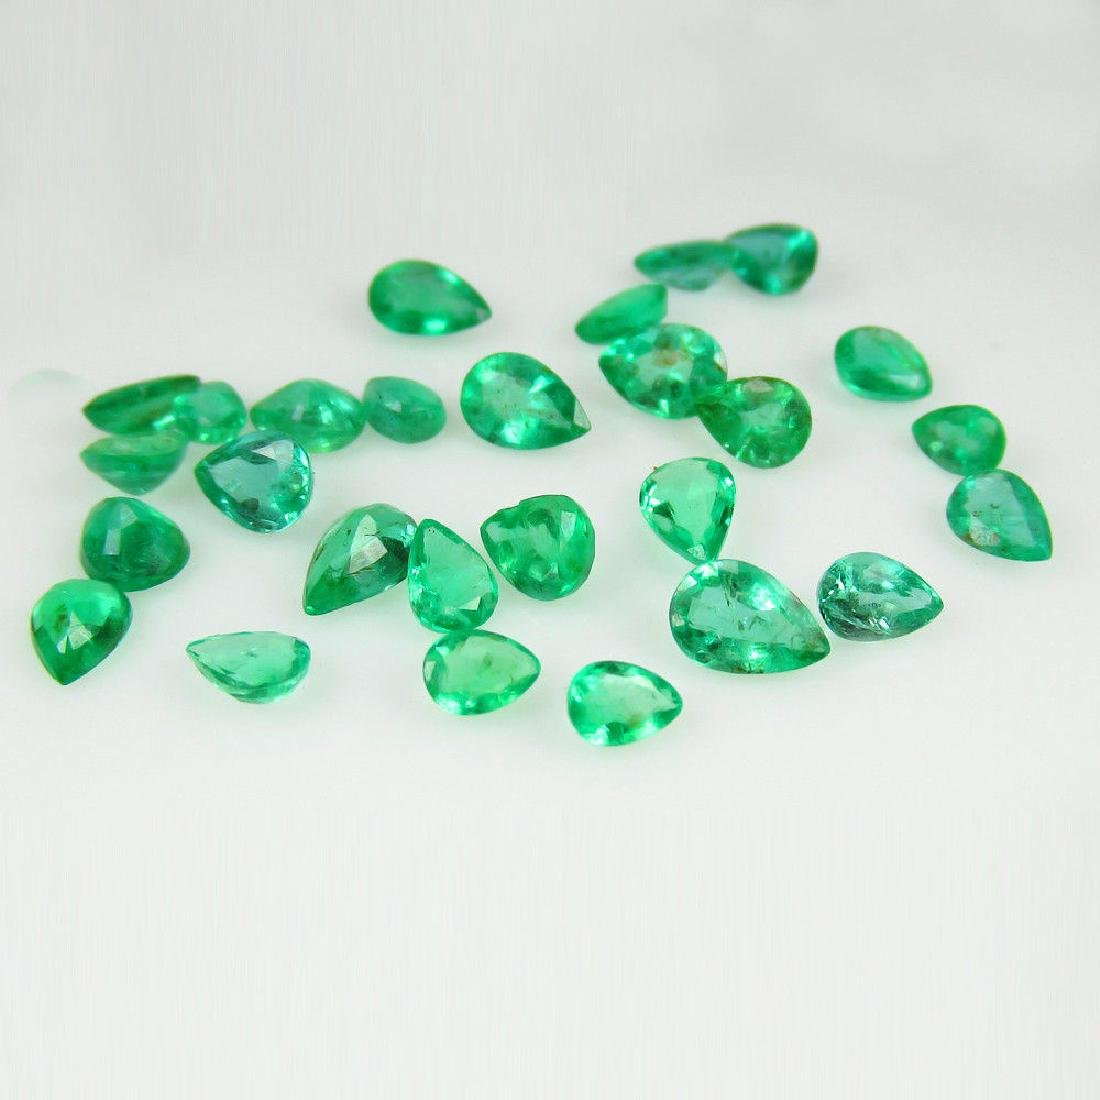 6.58 Carat 27 Loose Emeralds Pear cut Lot